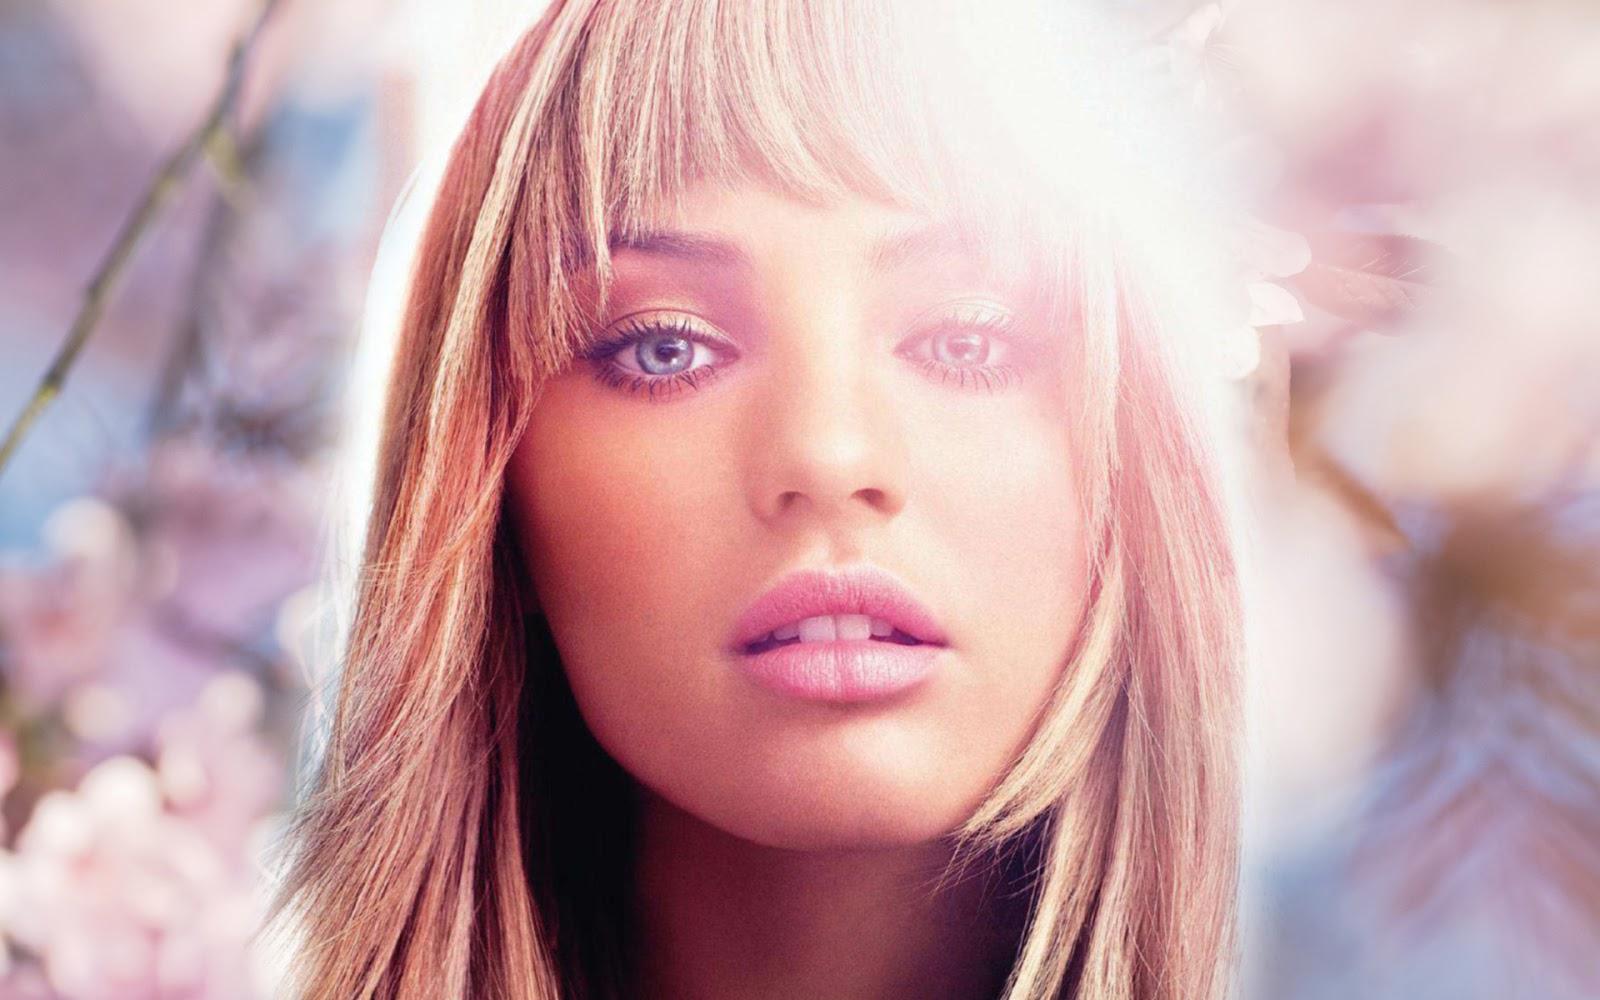 Candice Swanepoel Model Portrait